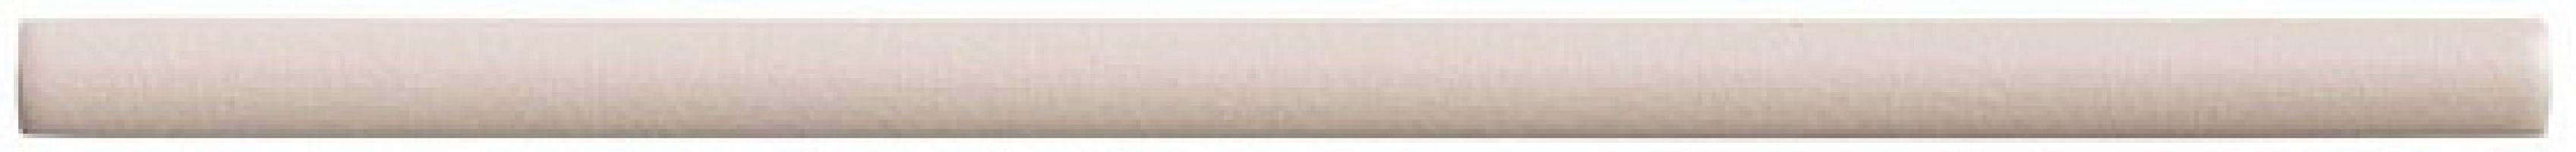 Бордюр Earth ADEH5017 Bullnose Trim Fawn 1.4x30 Adex